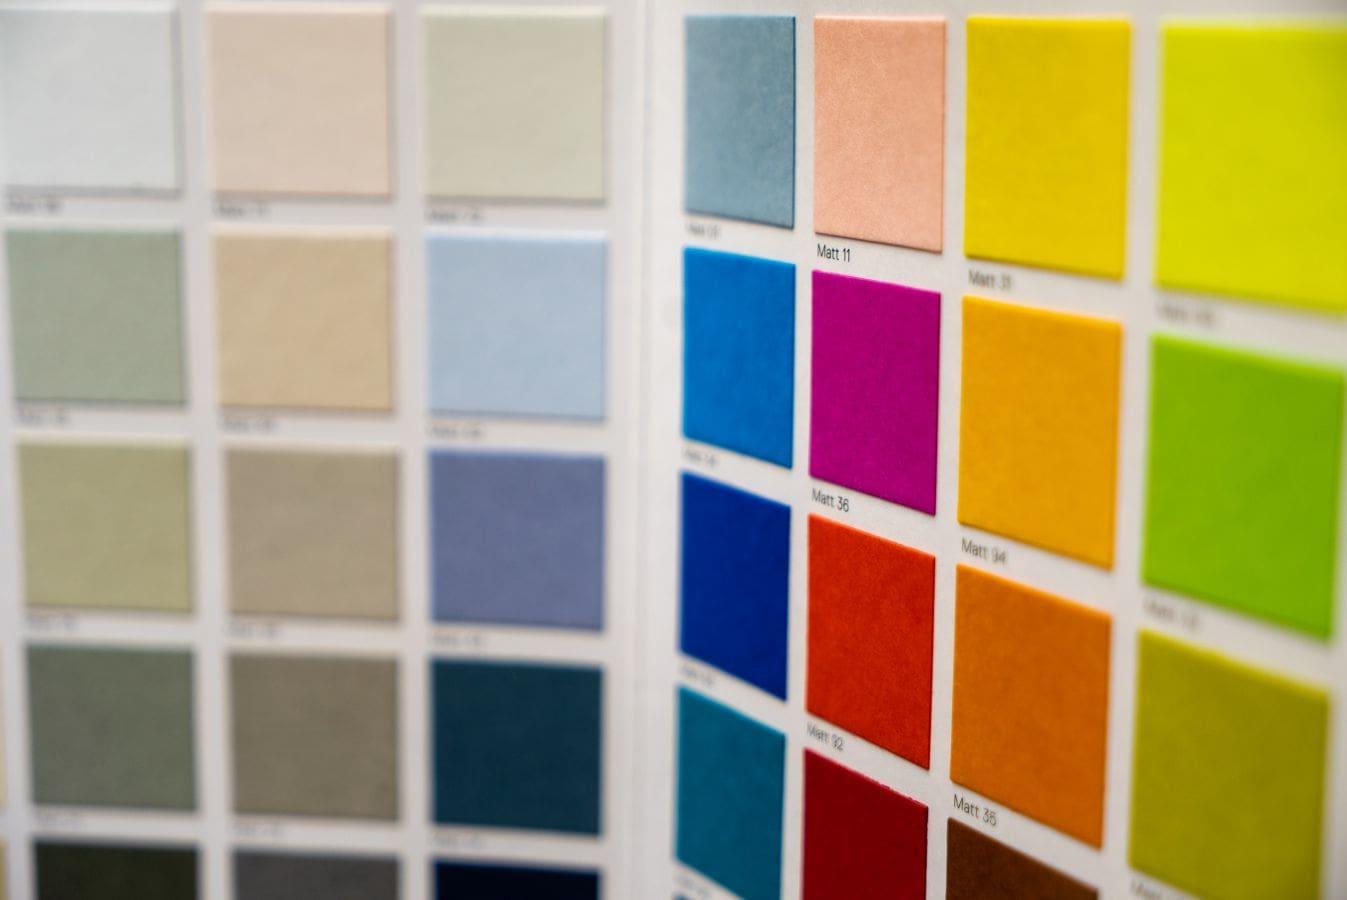 Factors to consider when choosing colour palettes